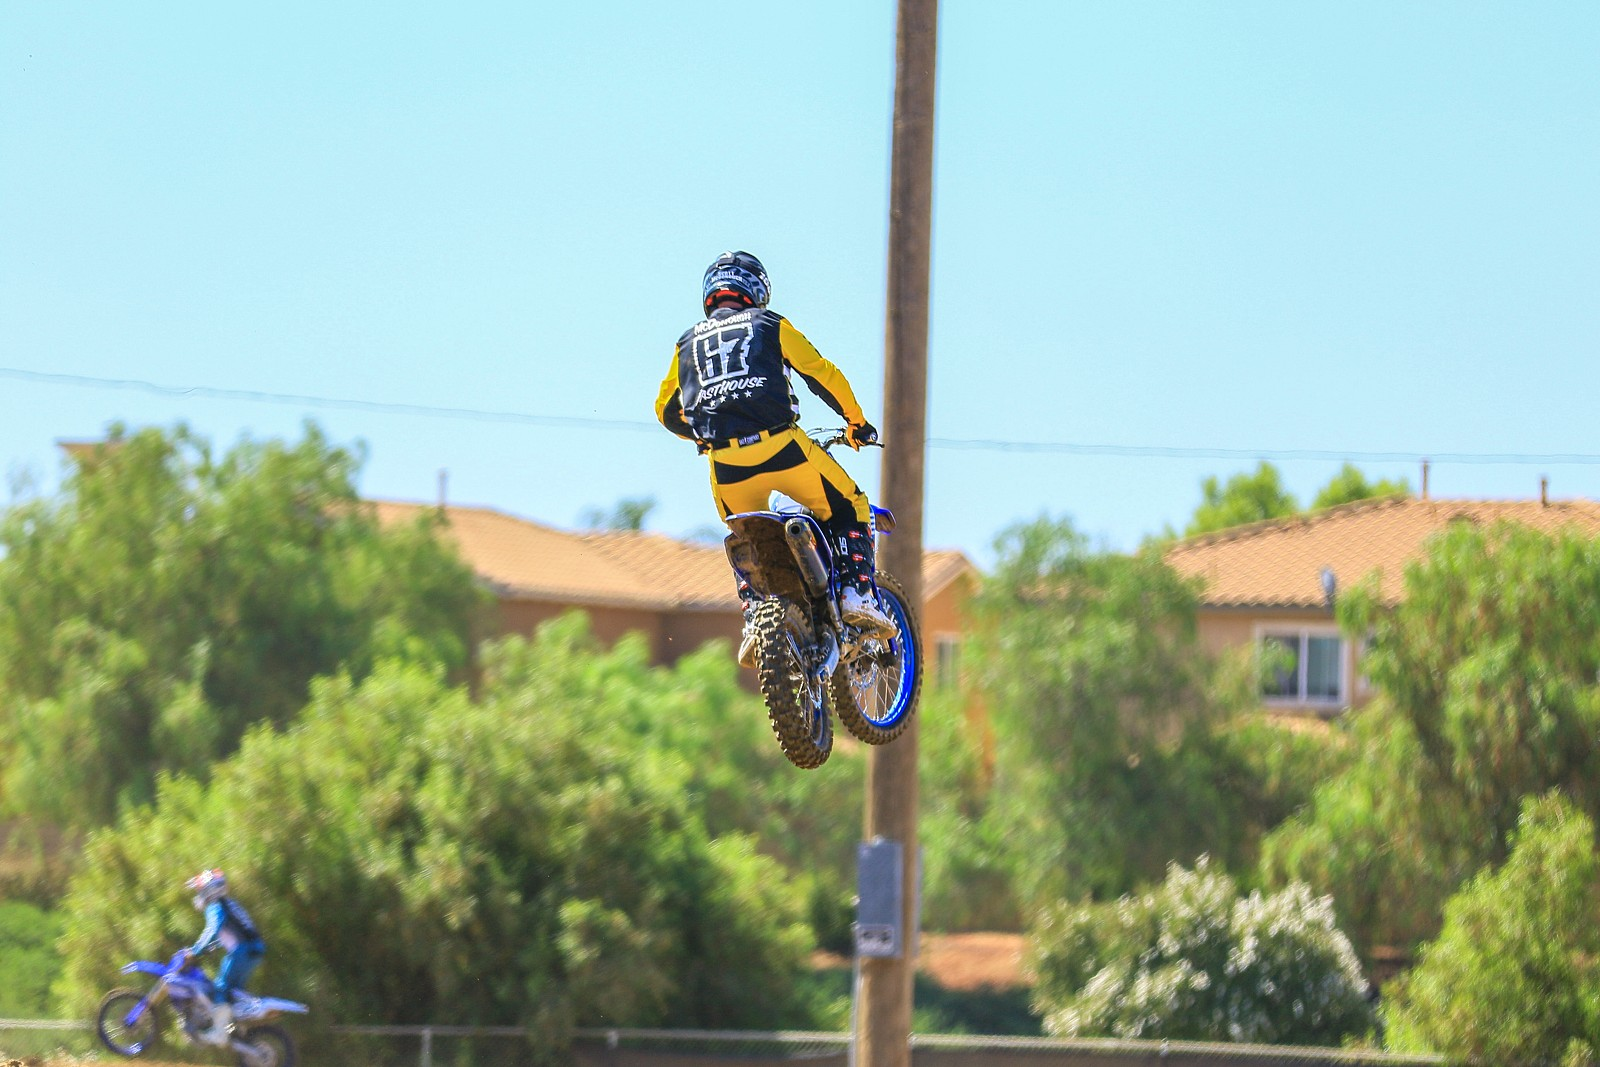 050A4925 - moto67e - Motocross Pictures - Vital MX